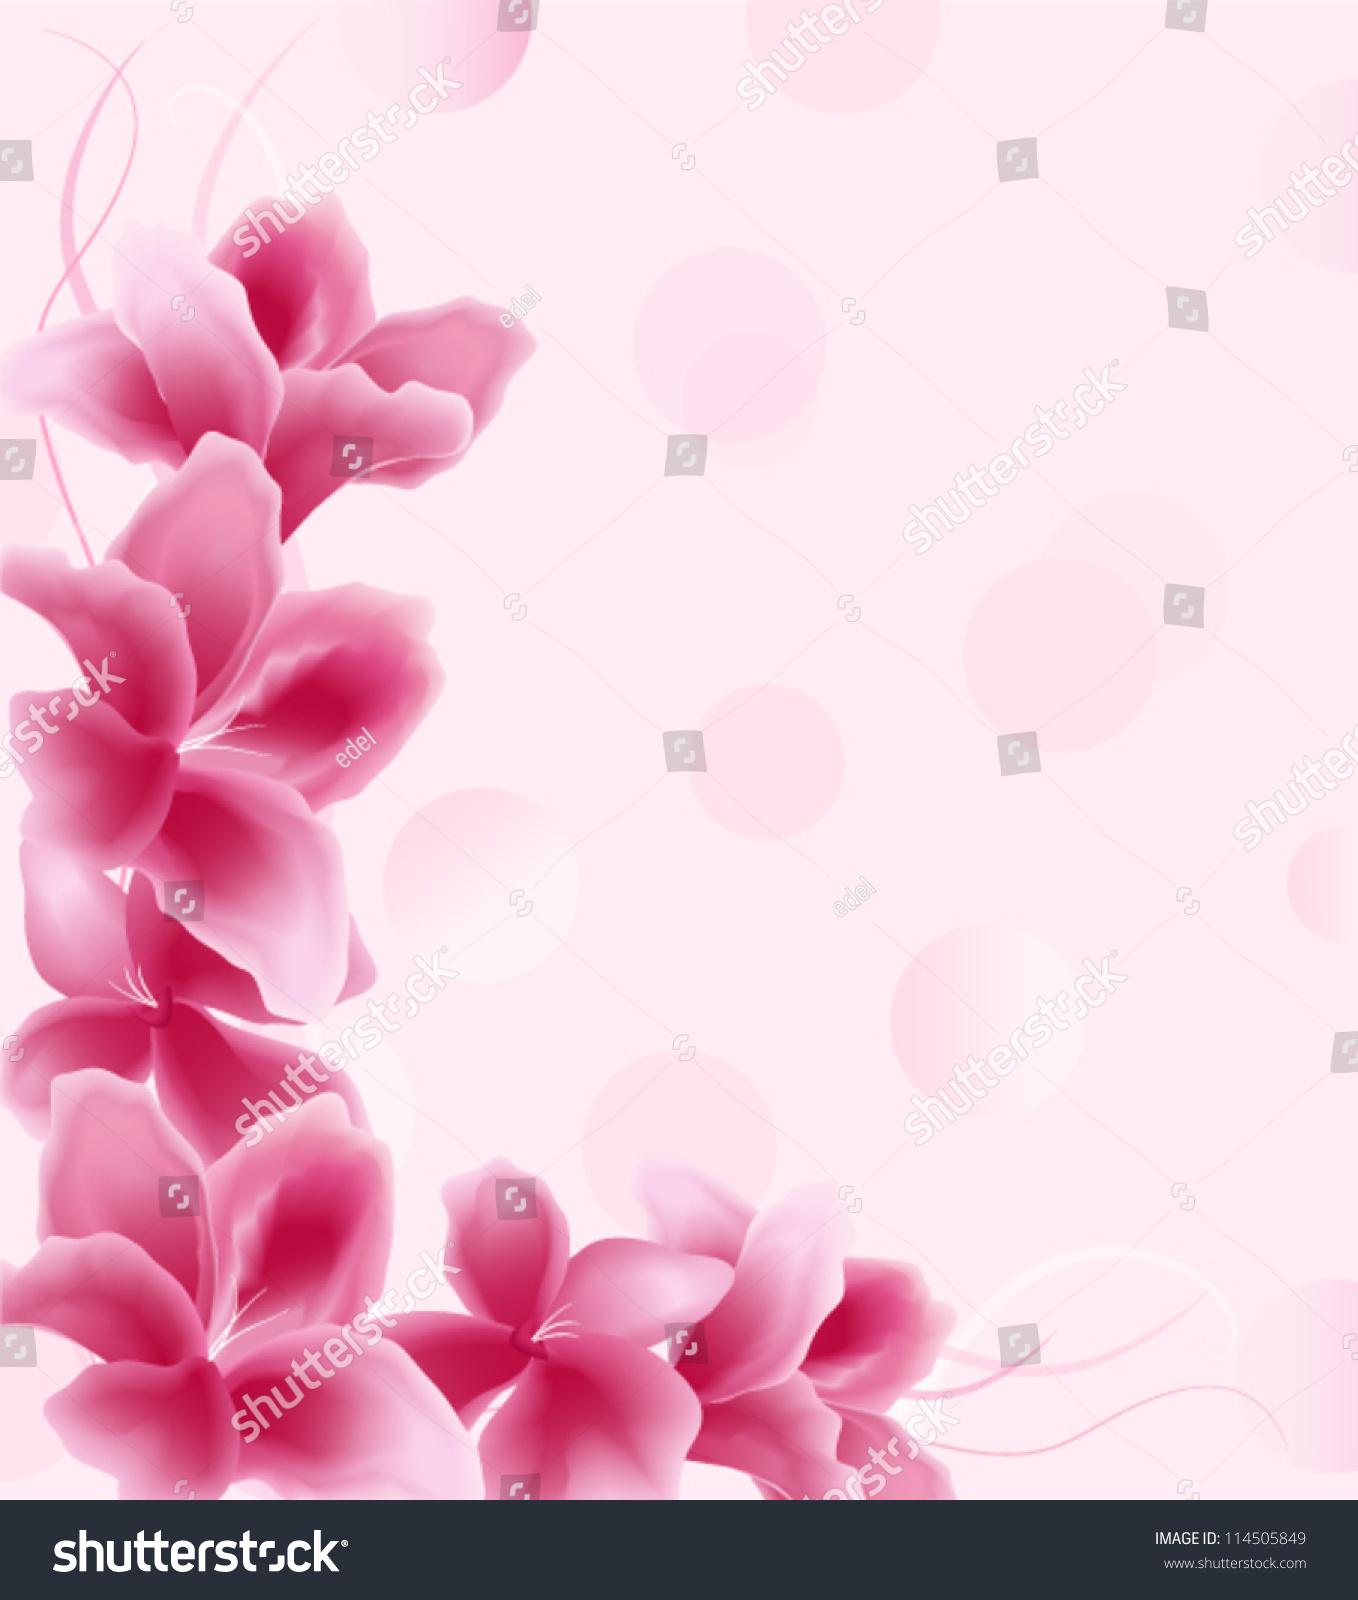 Pink Floral Background Wedding Card Image Vectorielle De Stock